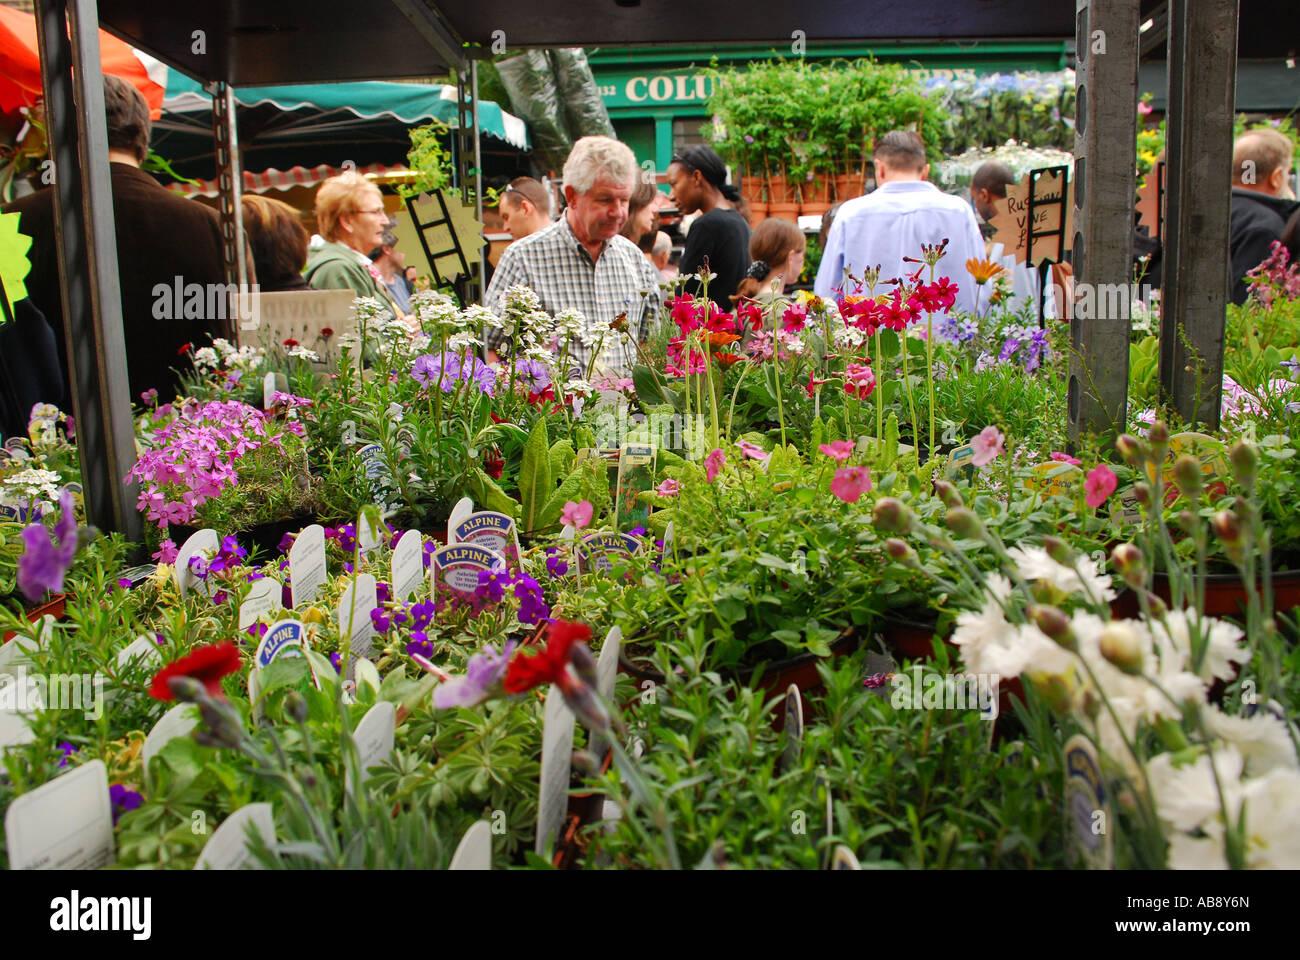 Columbia Road Flower Market London UK - Stock Image